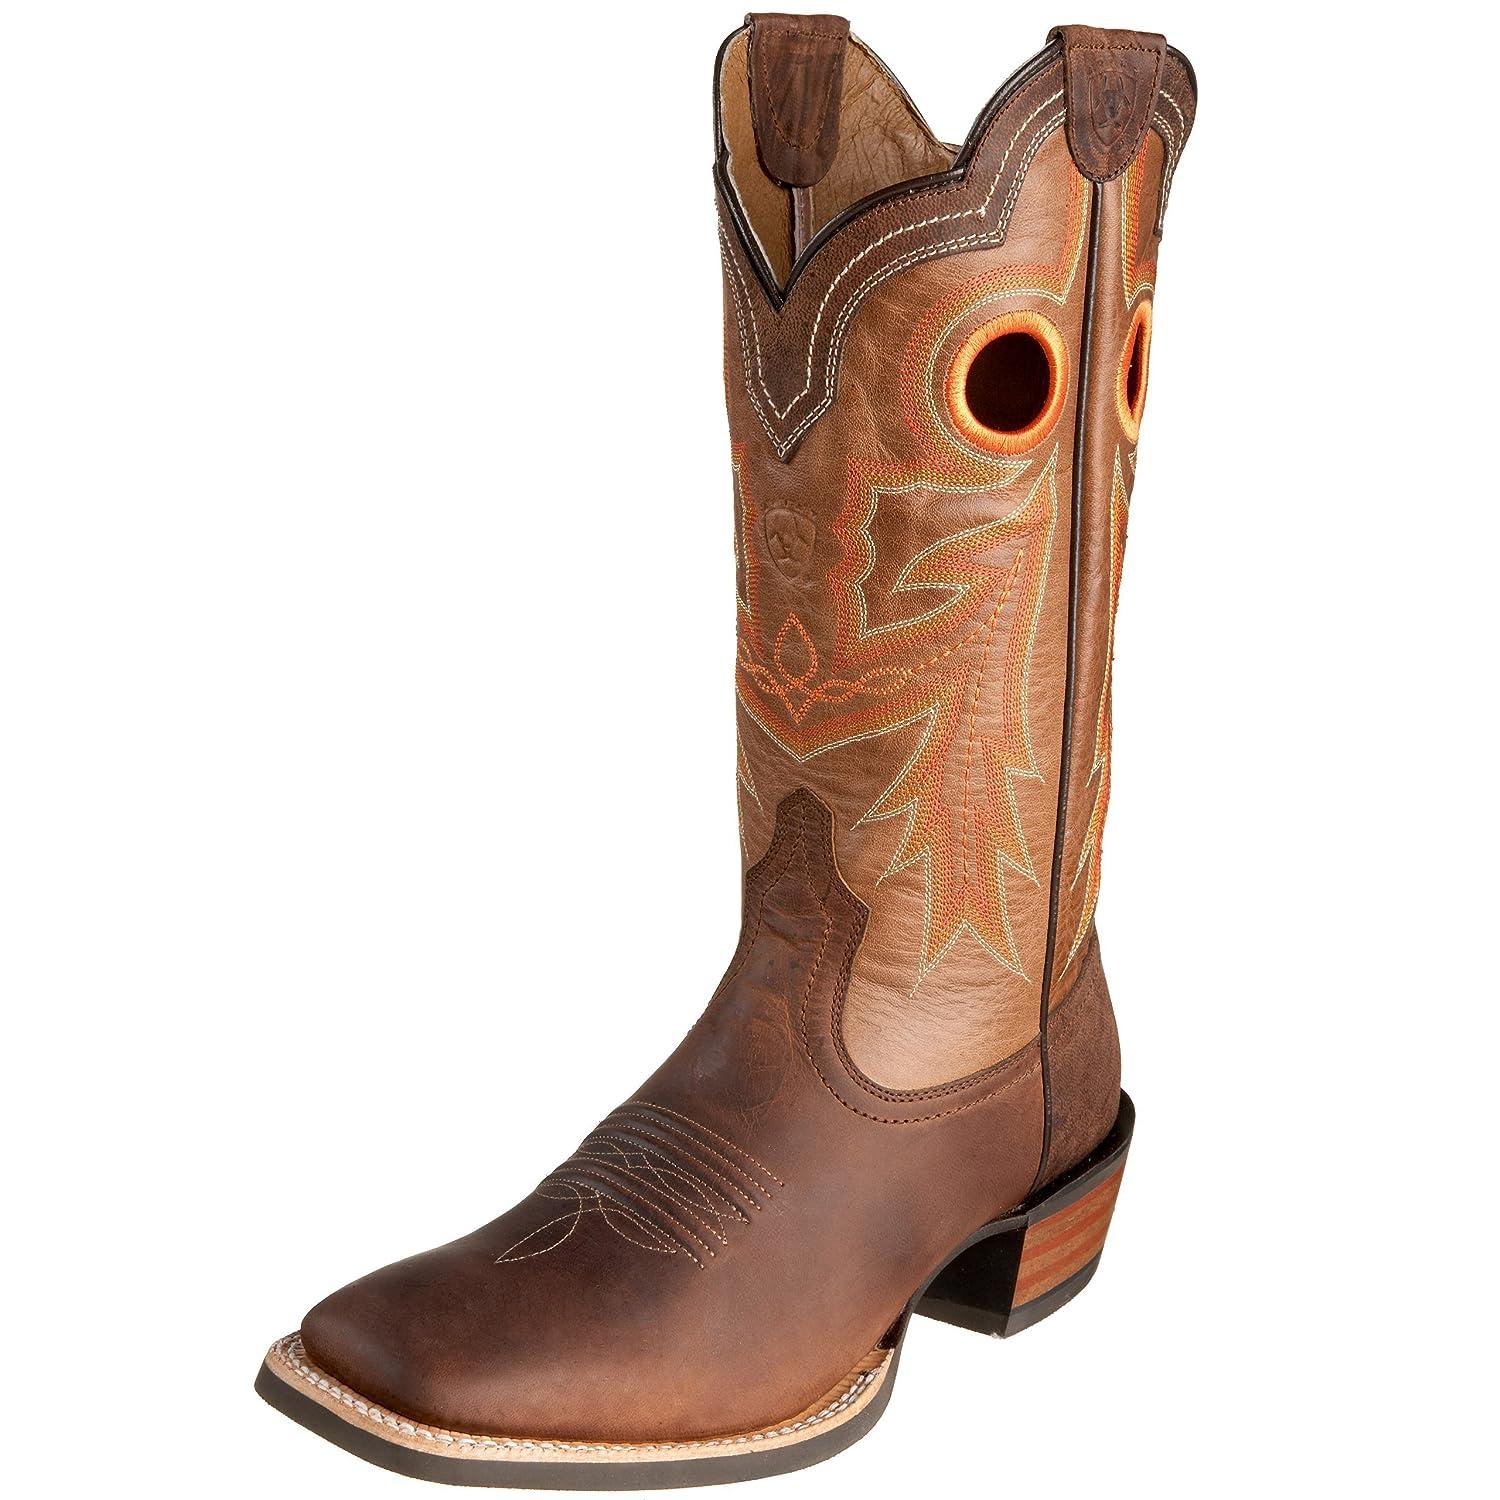 01f07857e8c Ariat Men's Wildstock Western Cowboy Boot